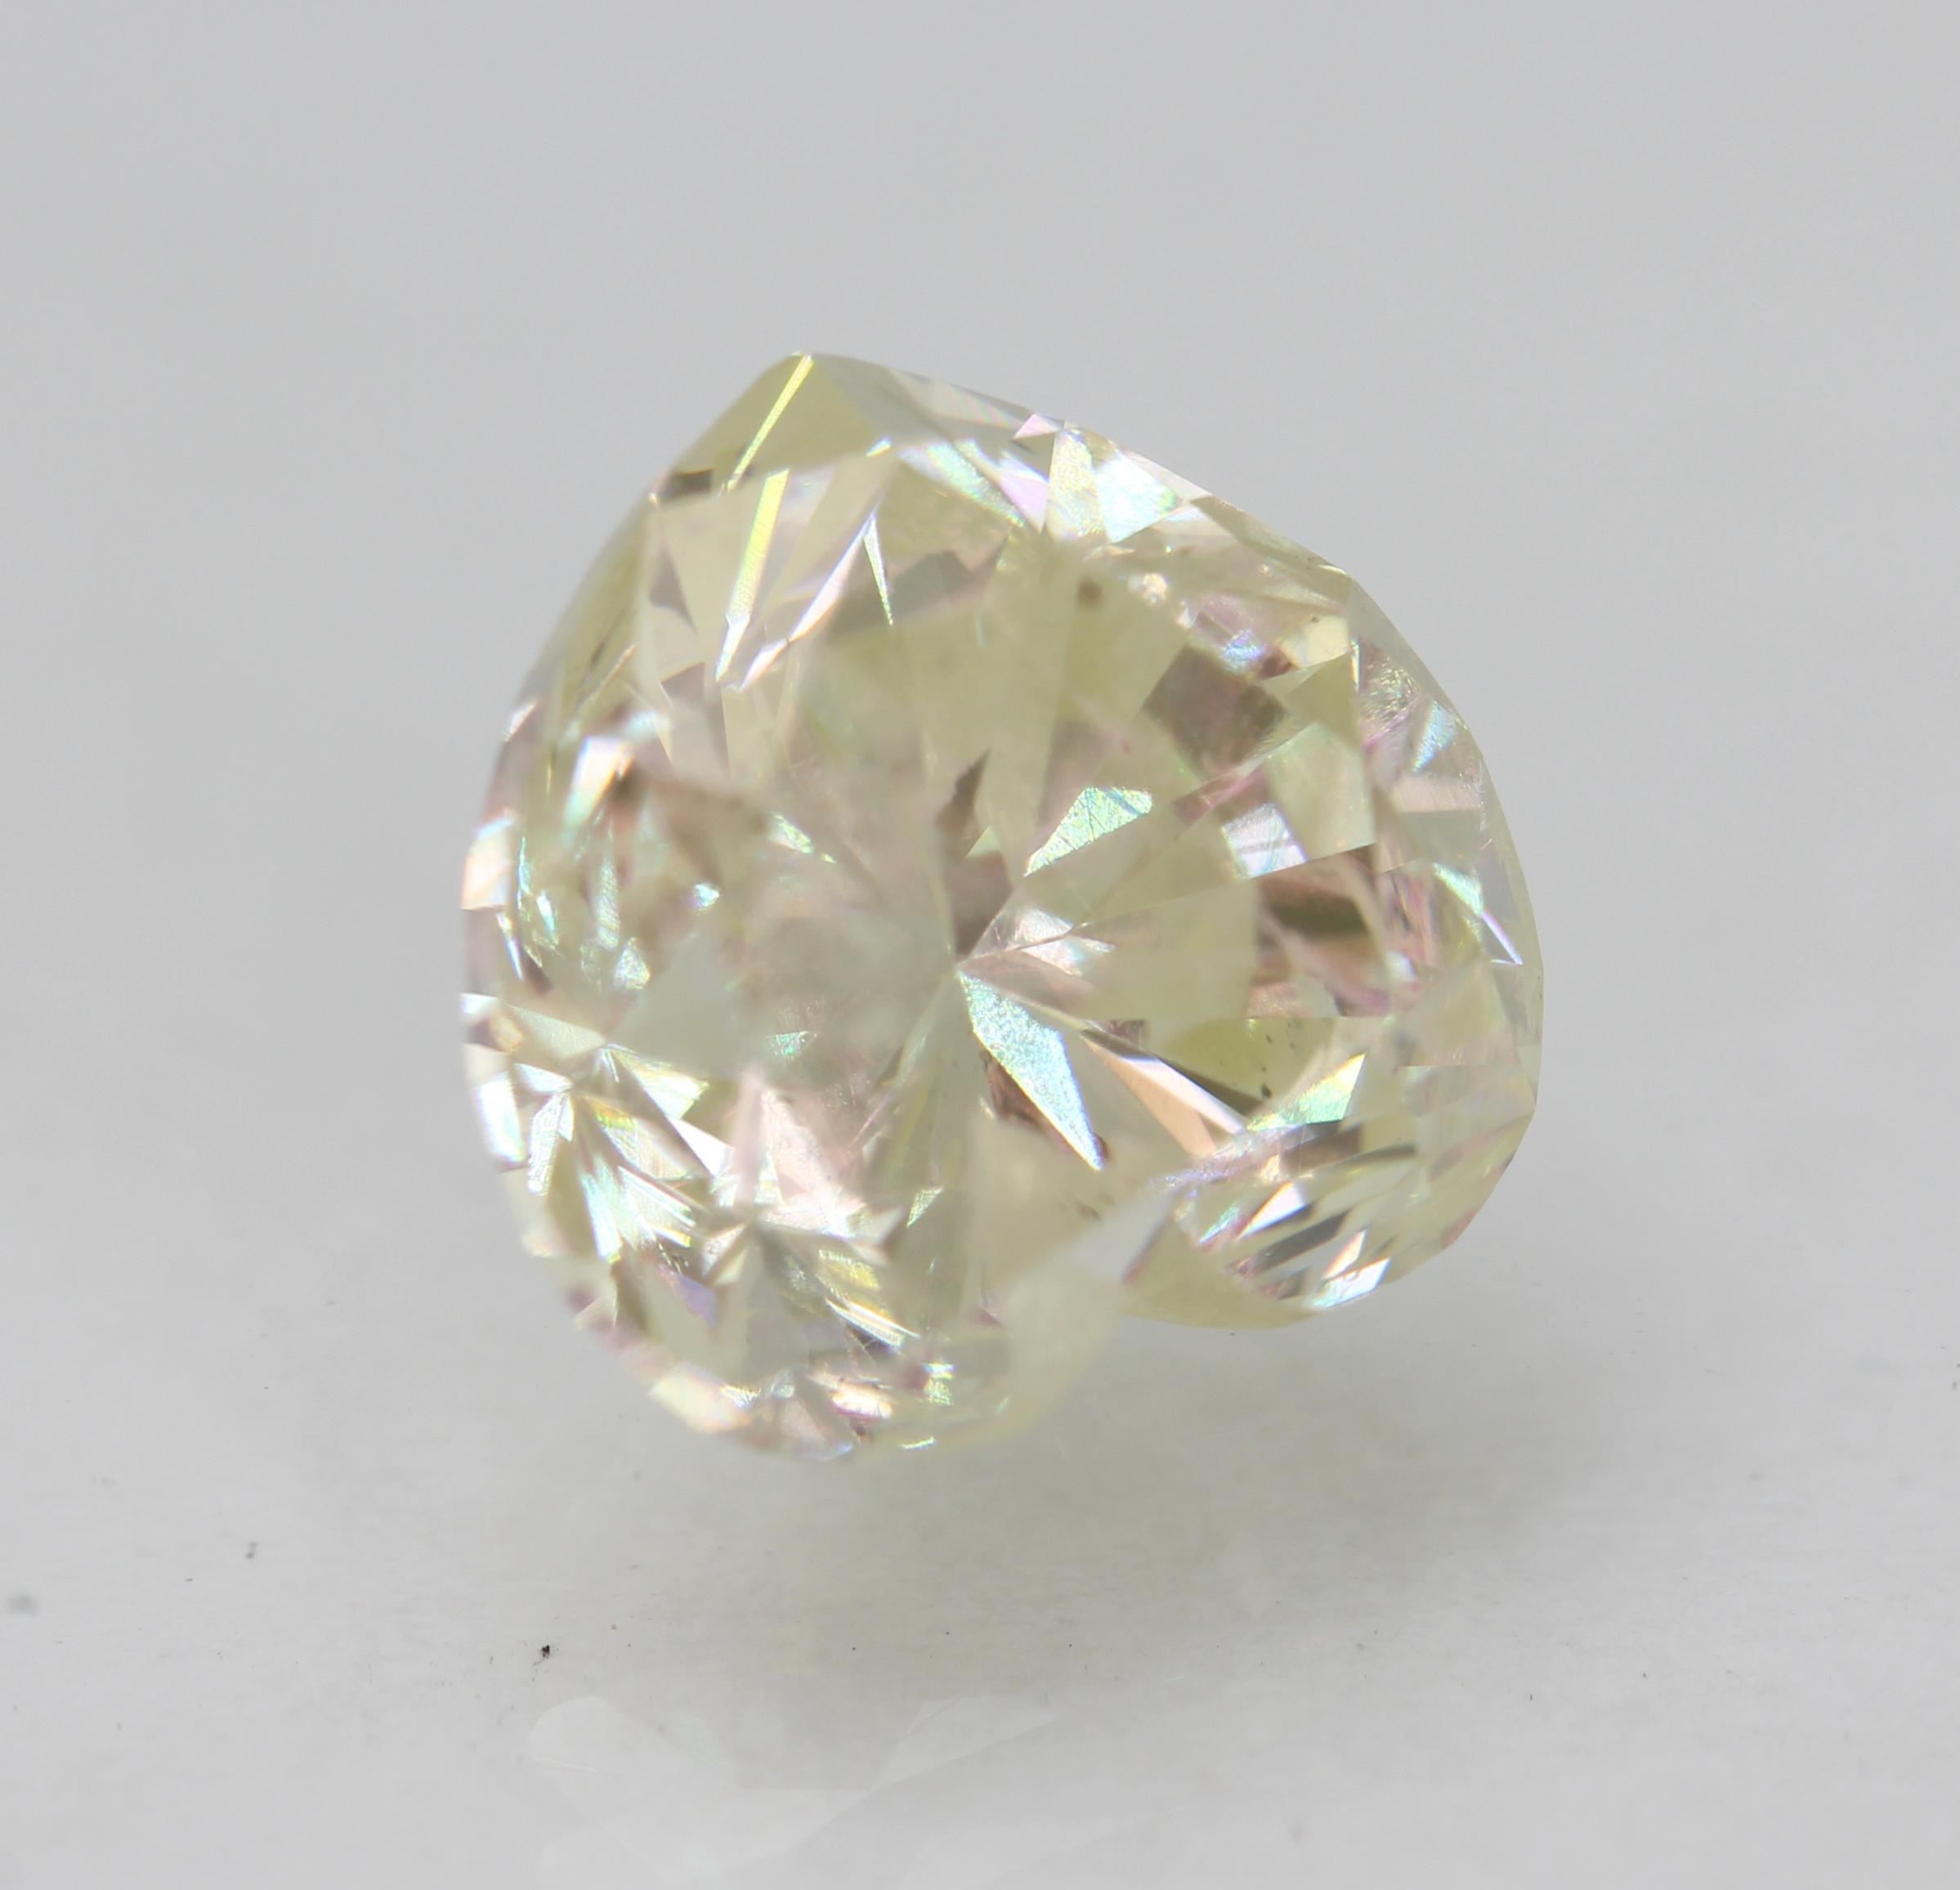 Certified 2.91 Carat J Color SI1 Heart Enhanced Natural Loose Diamond 8.62x8.39m